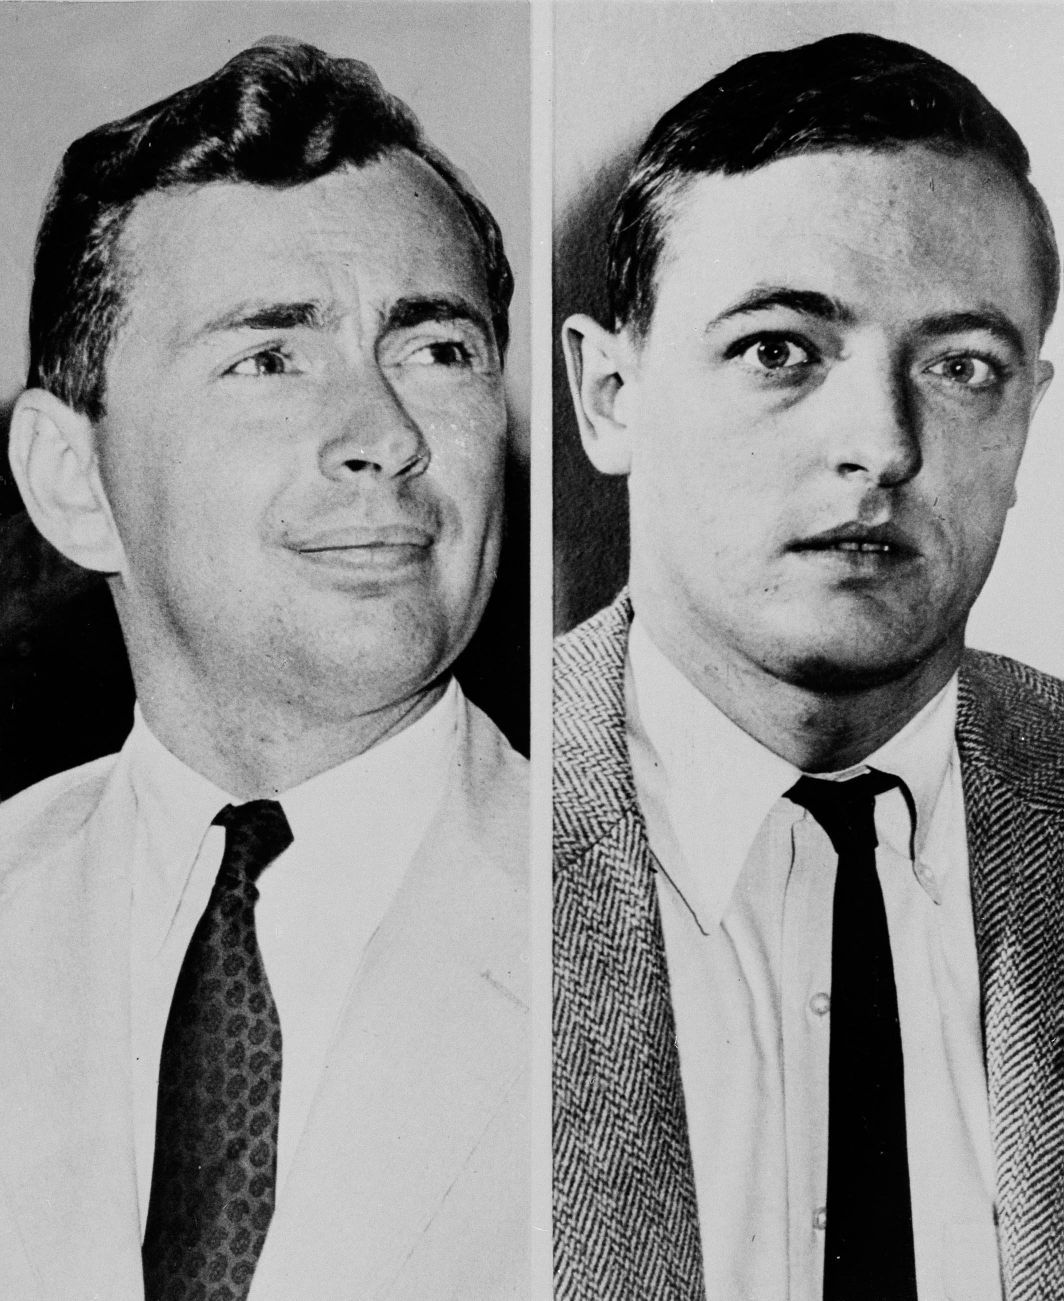 Vidal/Buckley